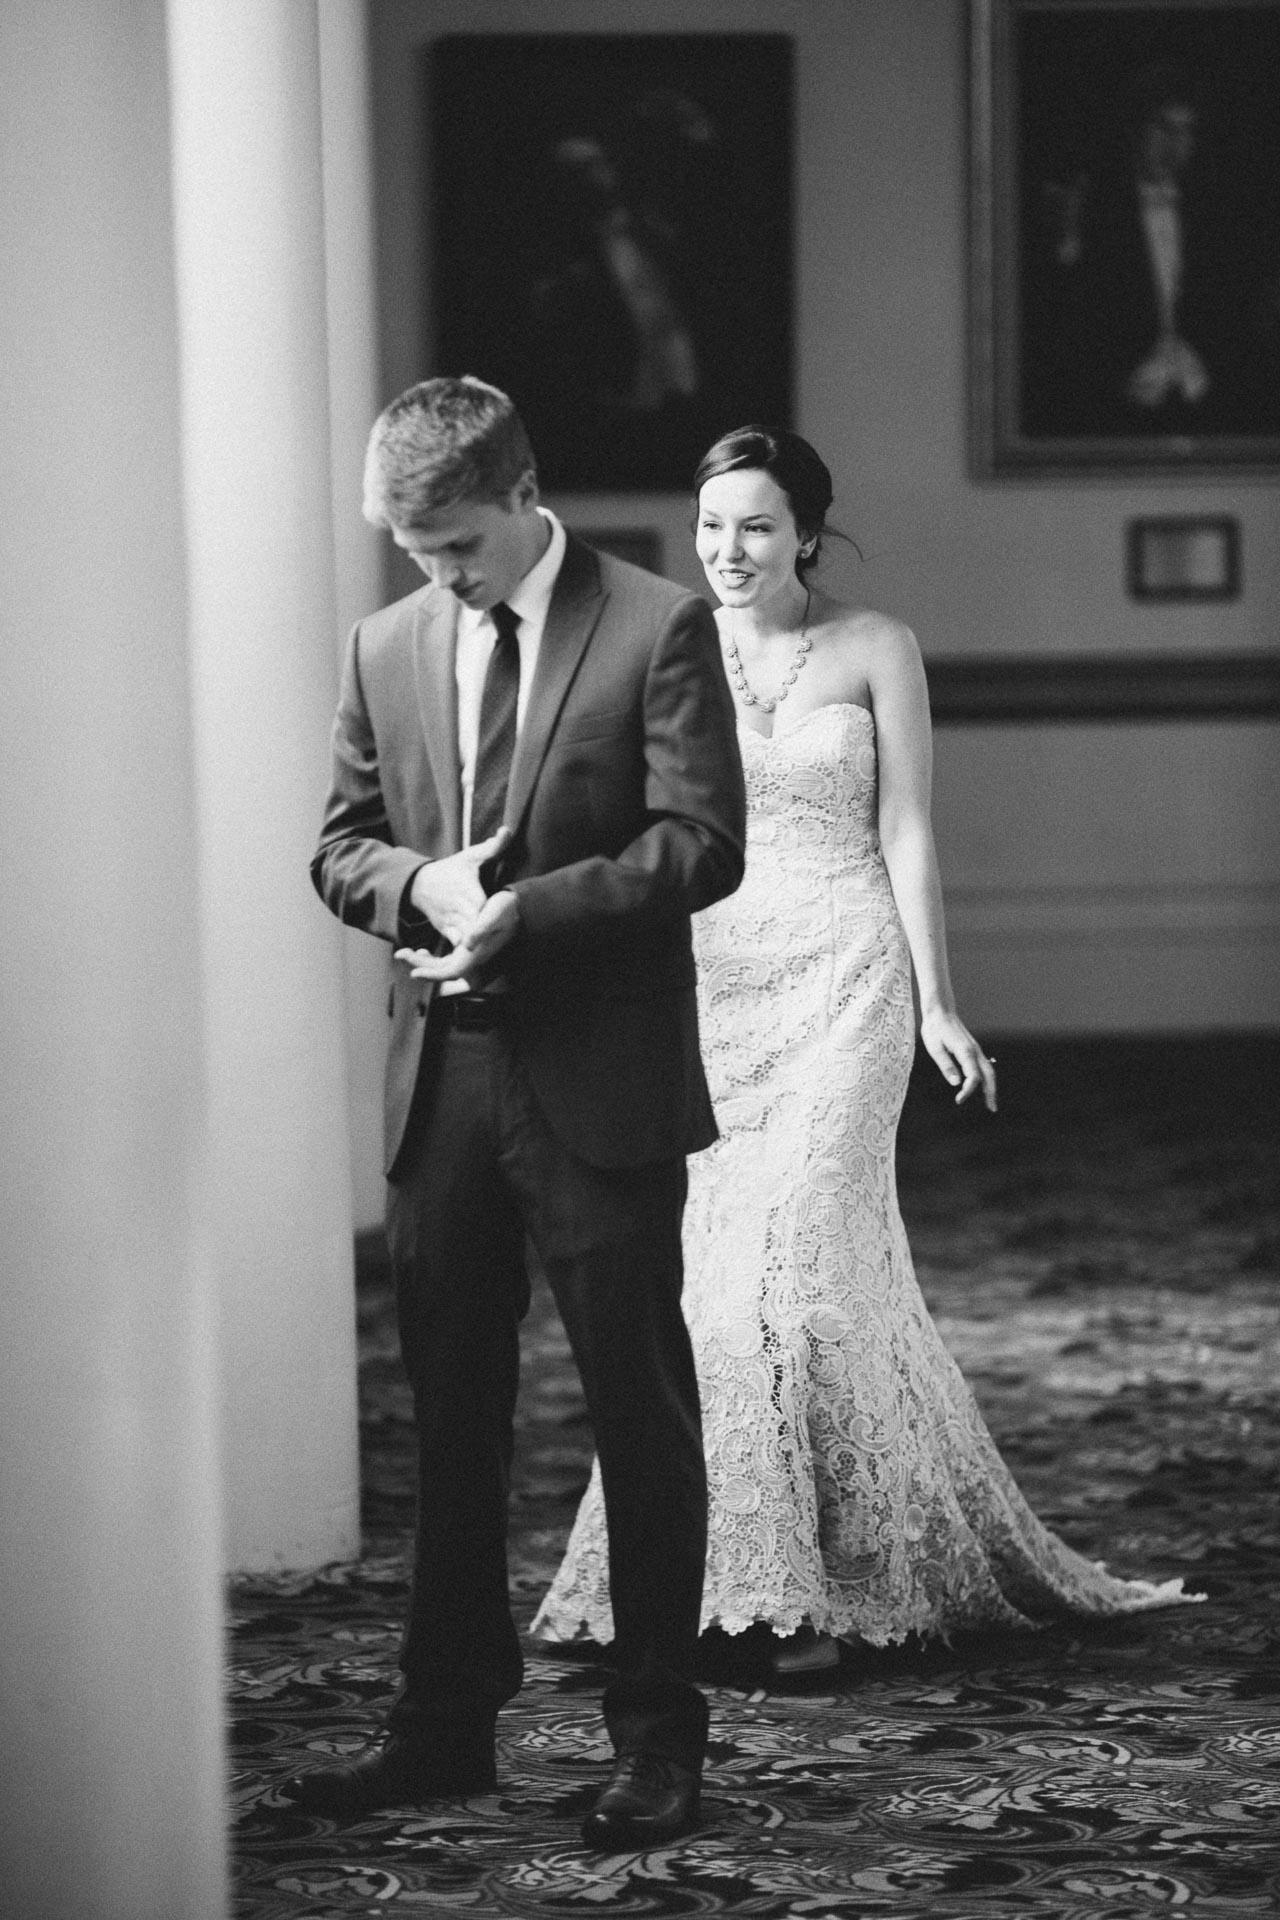 Julia-Michael-Cincinnati-Music-Hall-Wedding-045@2x.jpg